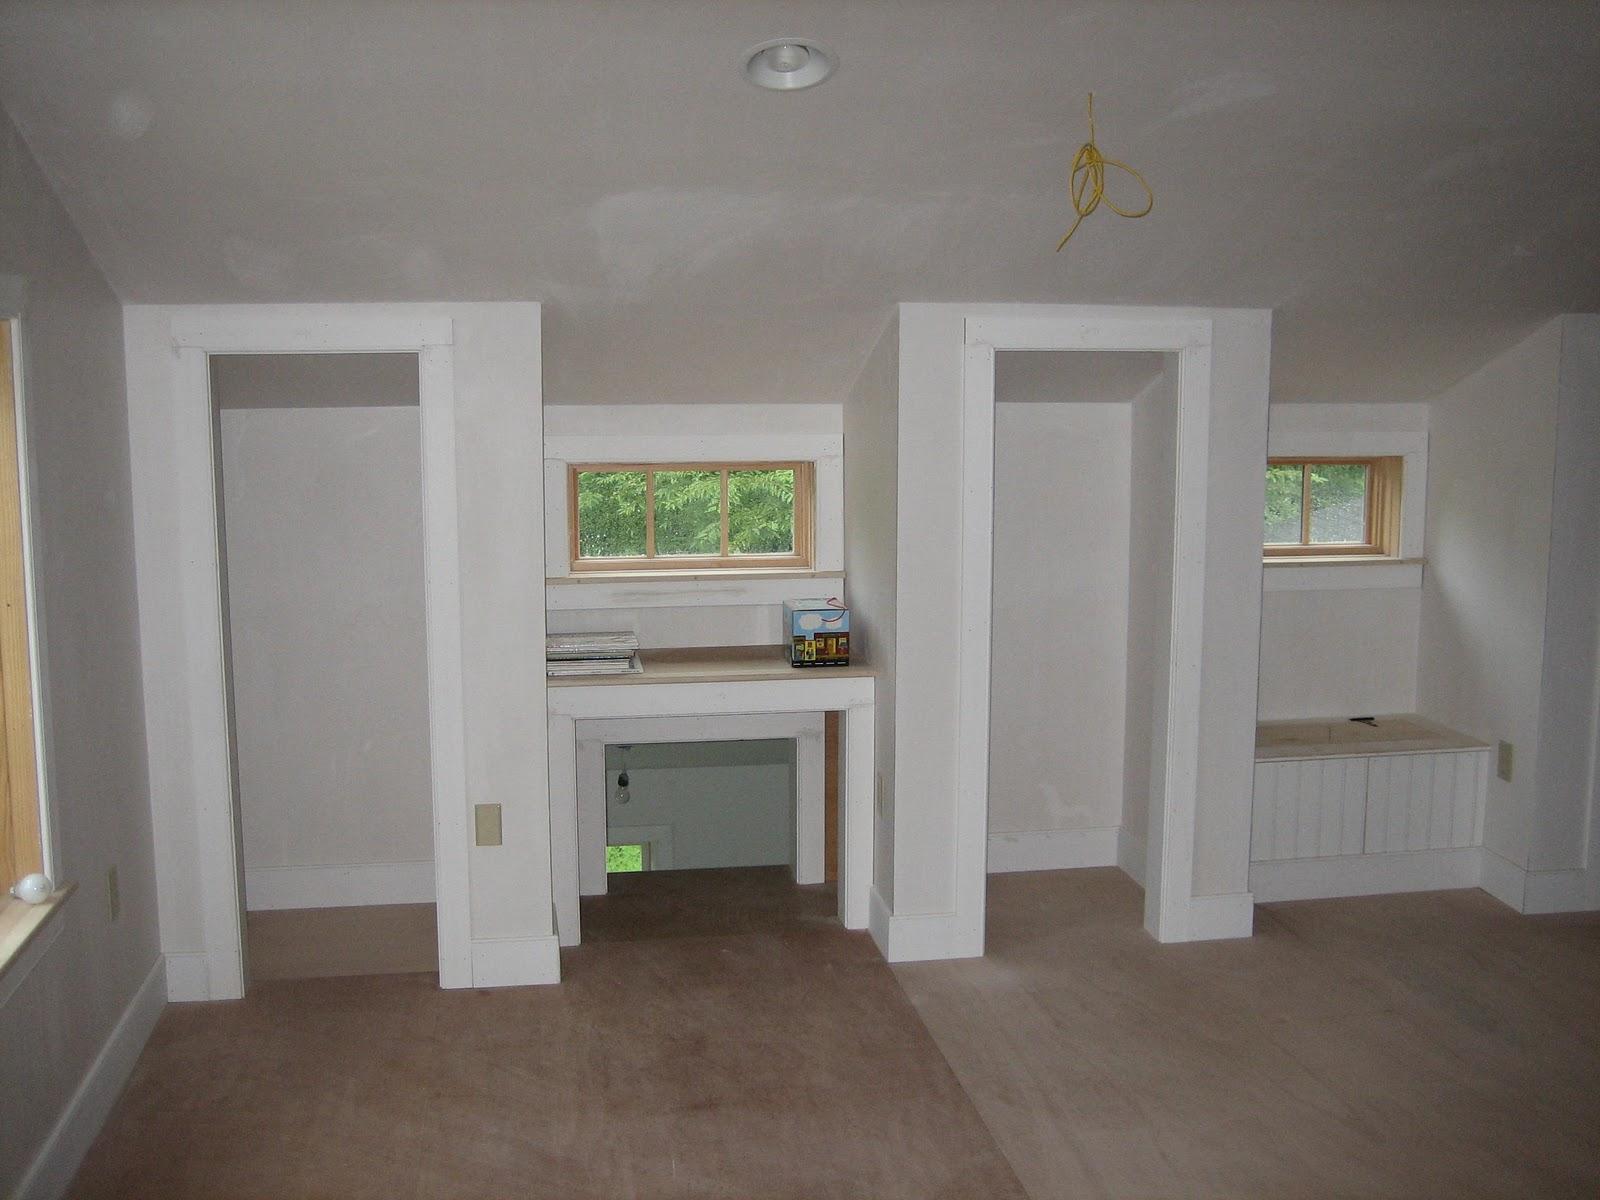 Boys Room Painted Subfloor Tutorial Painted Subfloor